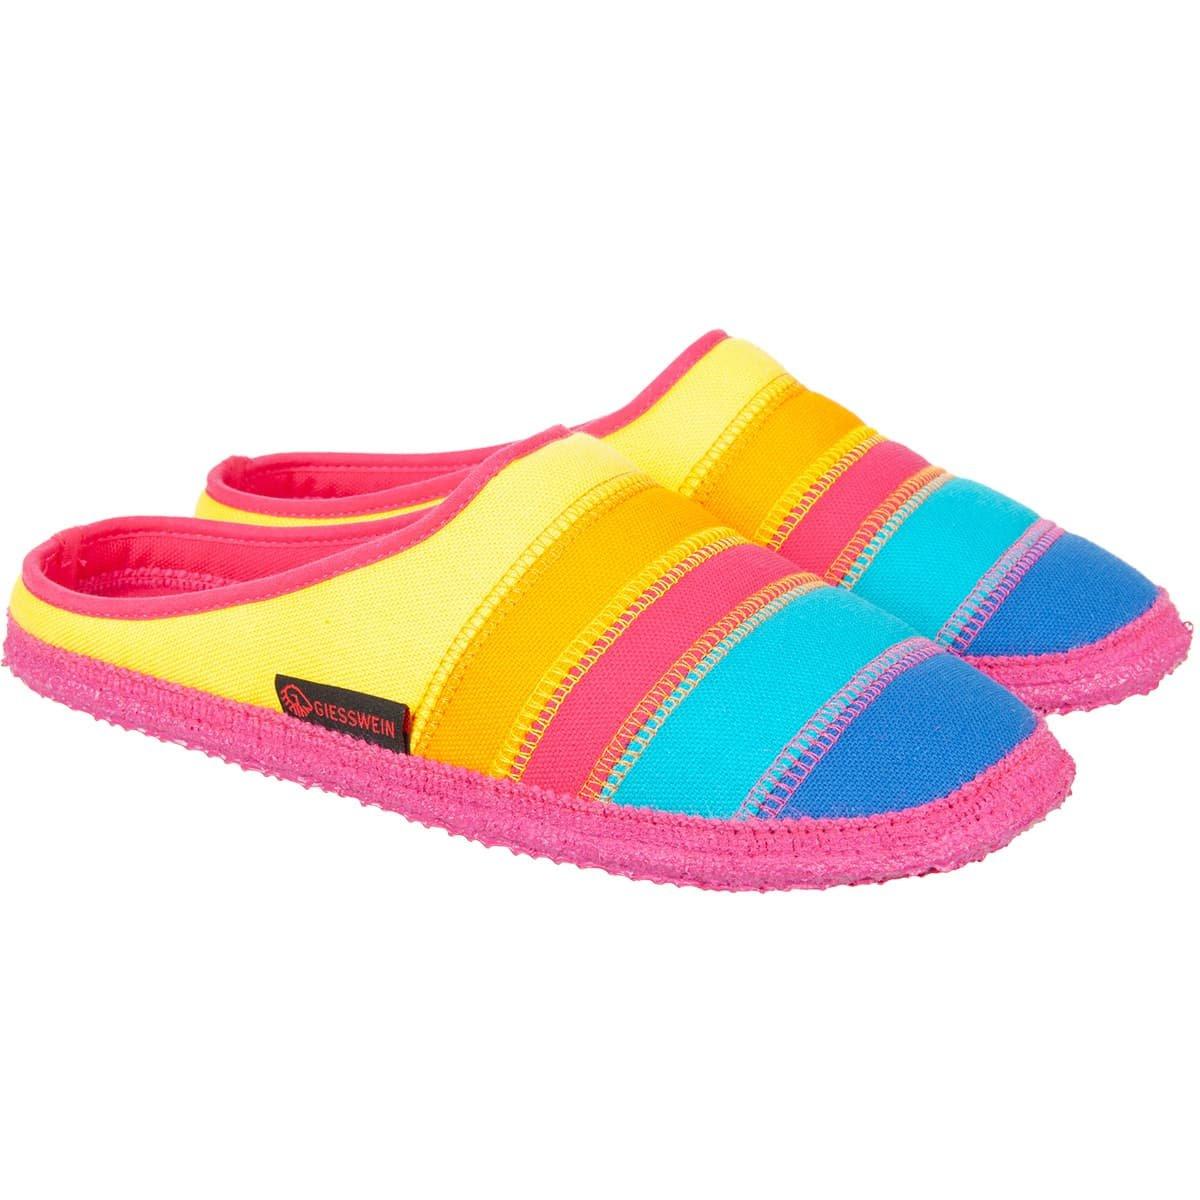 81434ef9ac32 ... Summer slippers for women model Azusa signed Giesswein